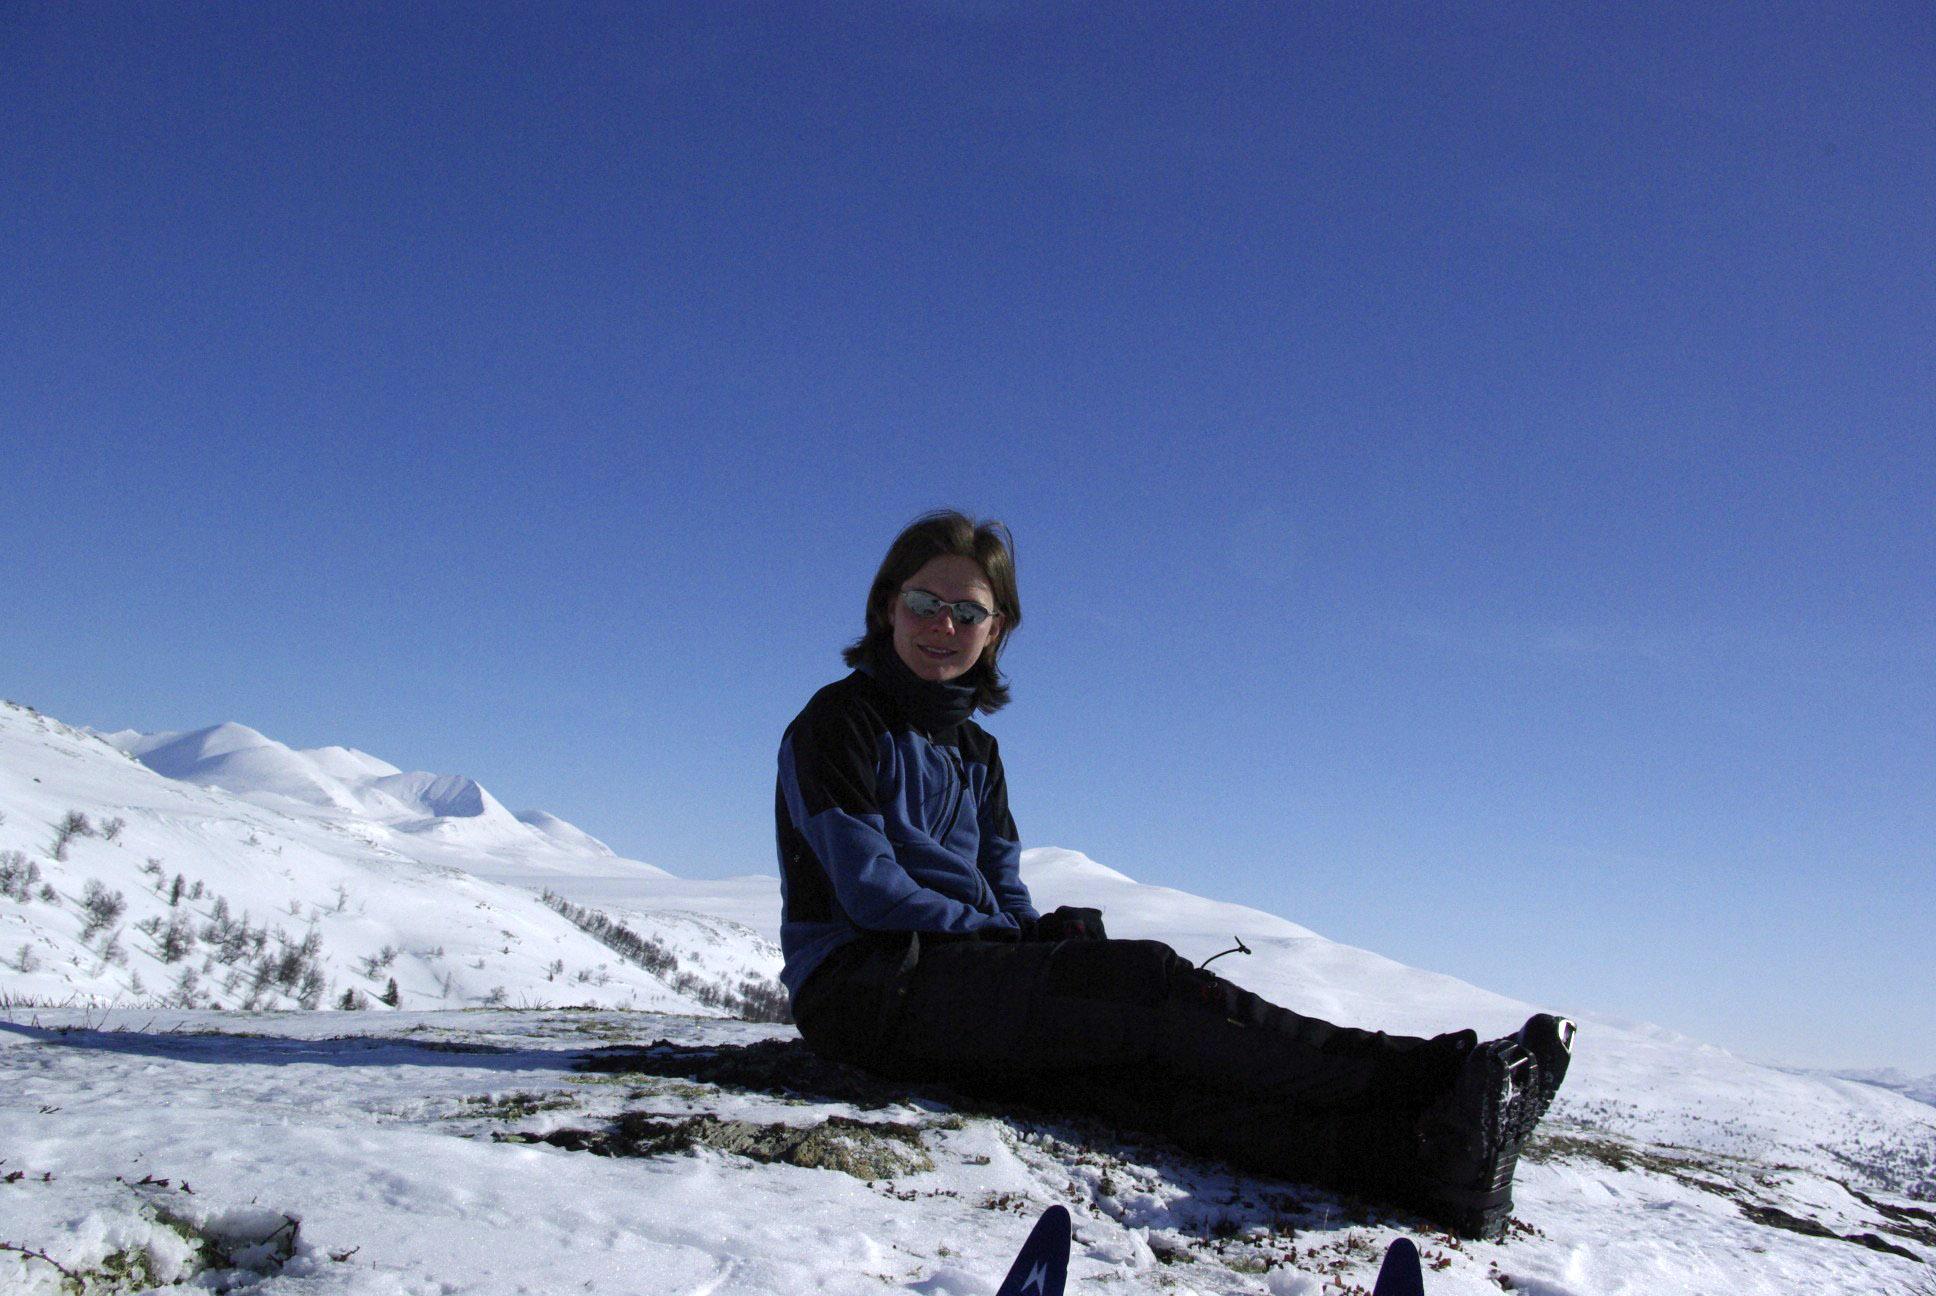 enziano_NadineOrmo_Backcountry.Skiing.in.Rondane_Norwegen